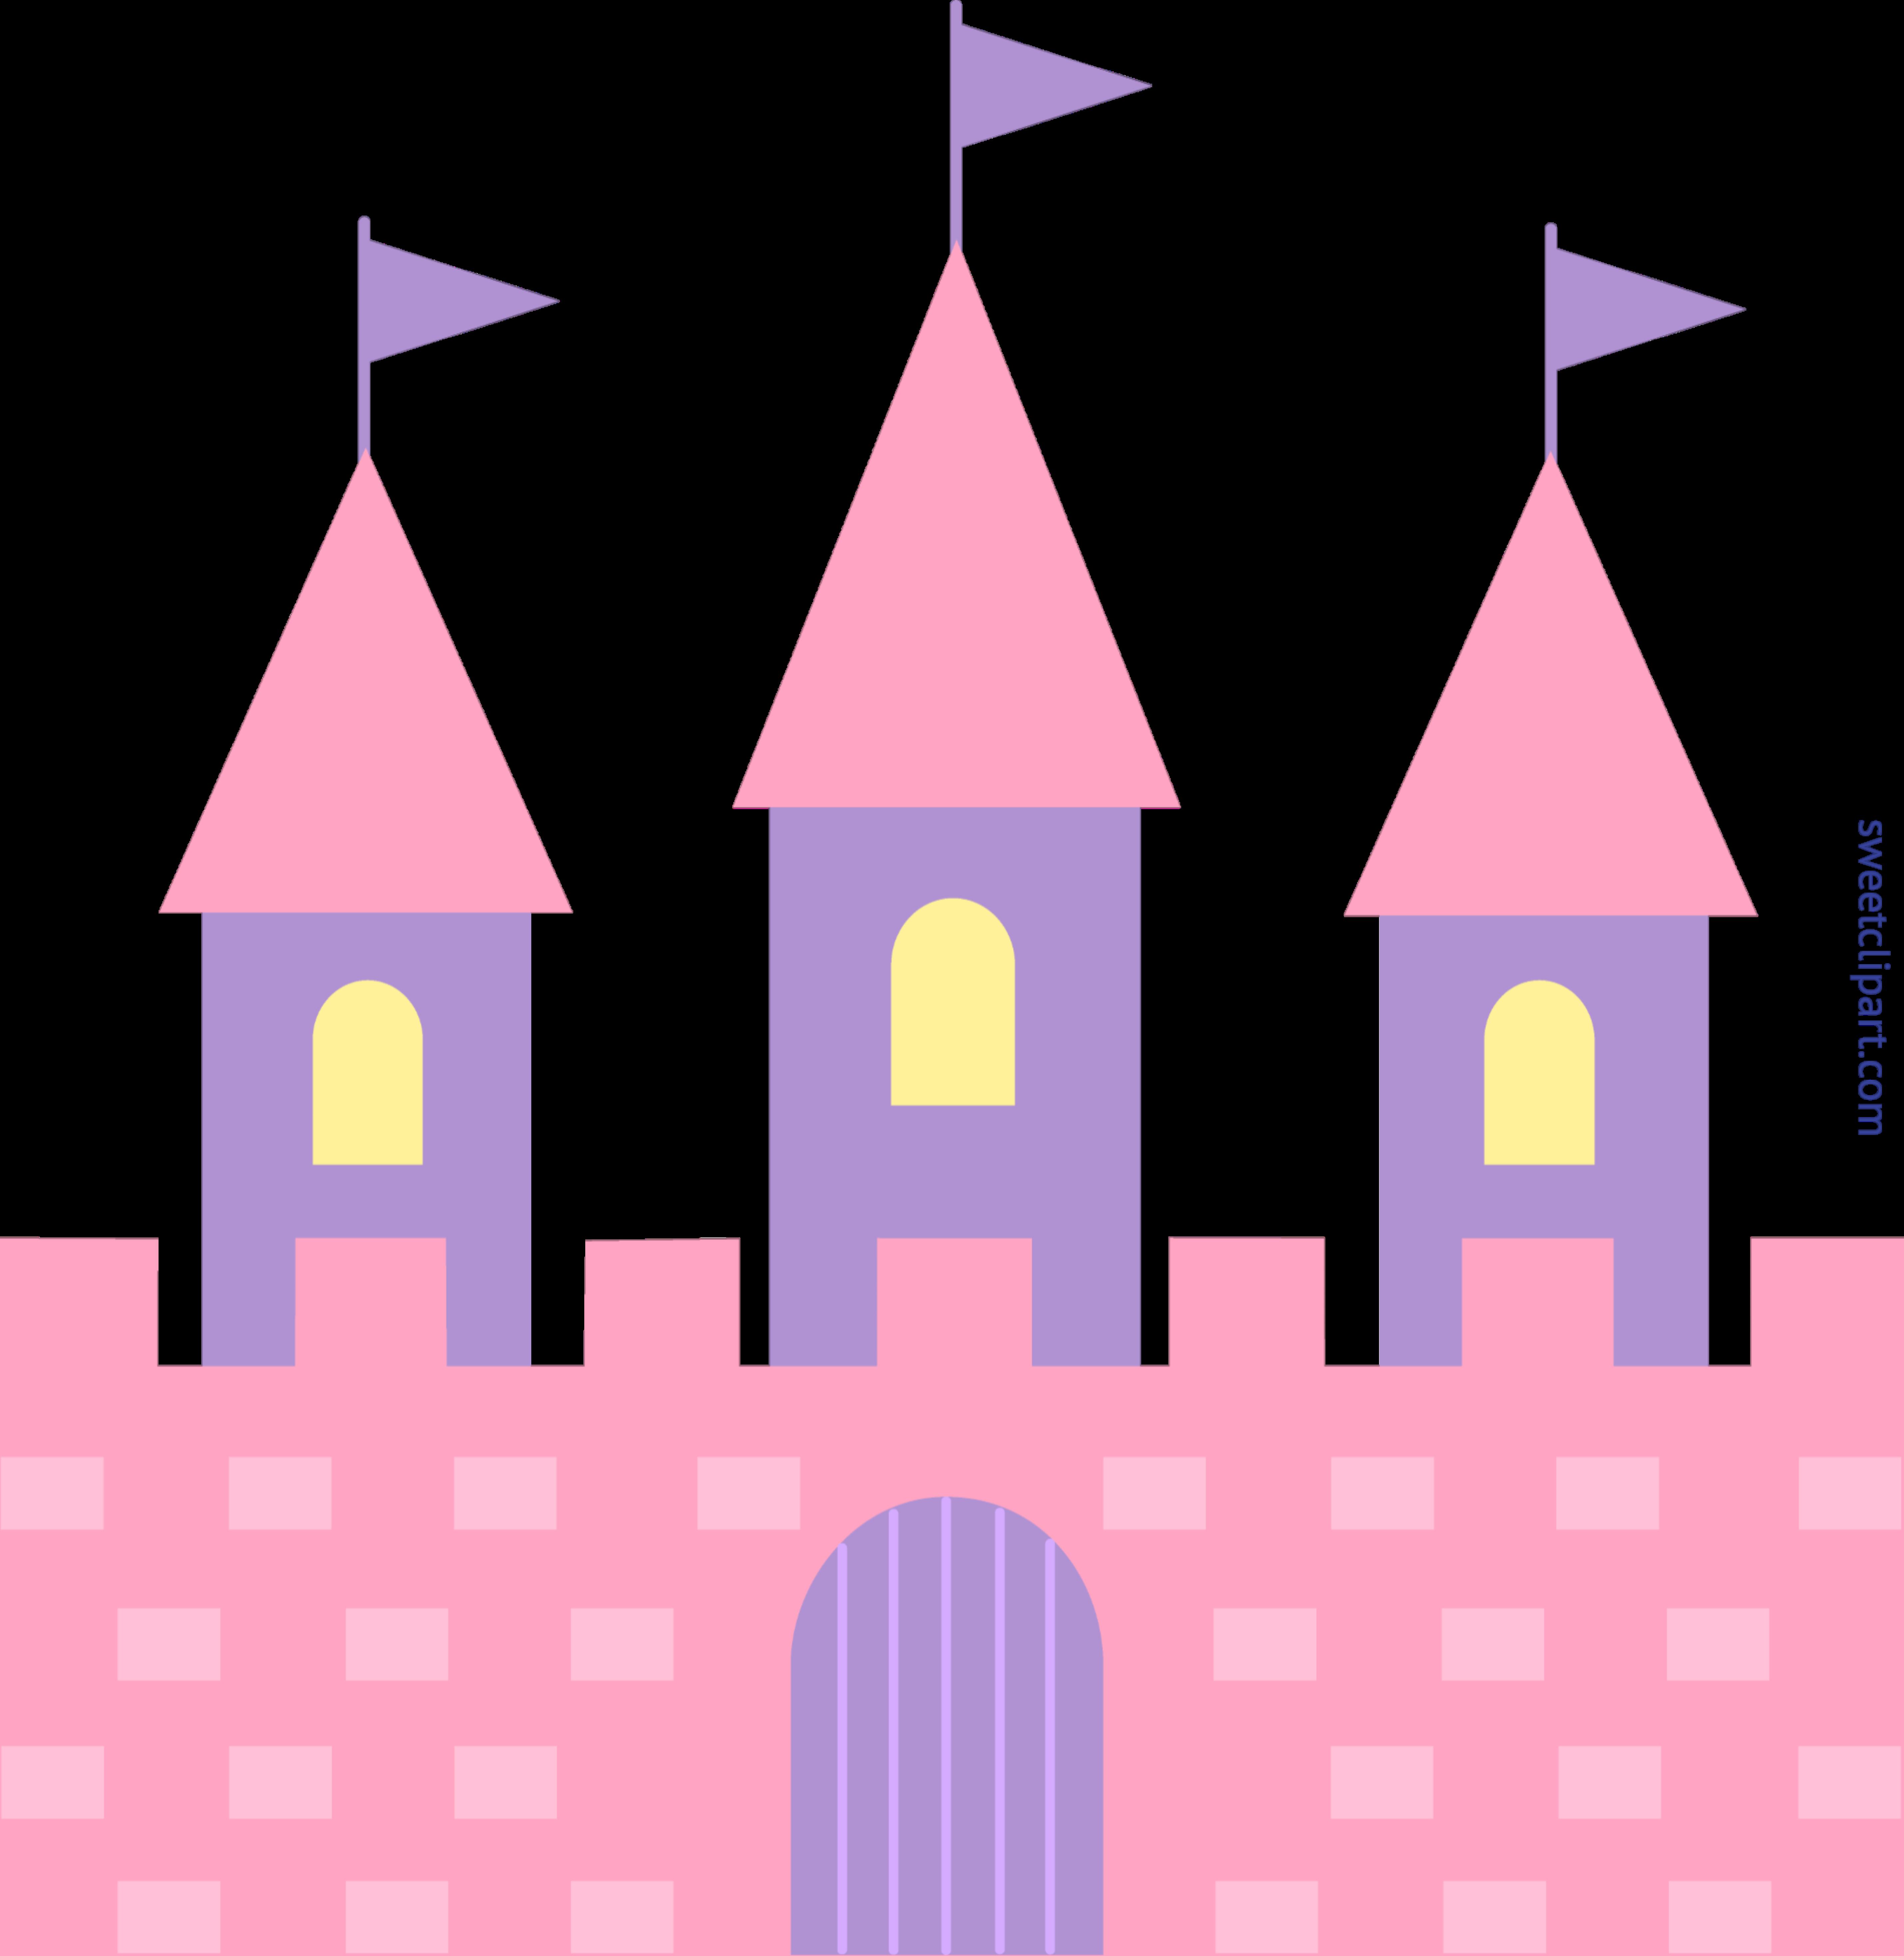 Clipart castle easy. Pink clip art sweet